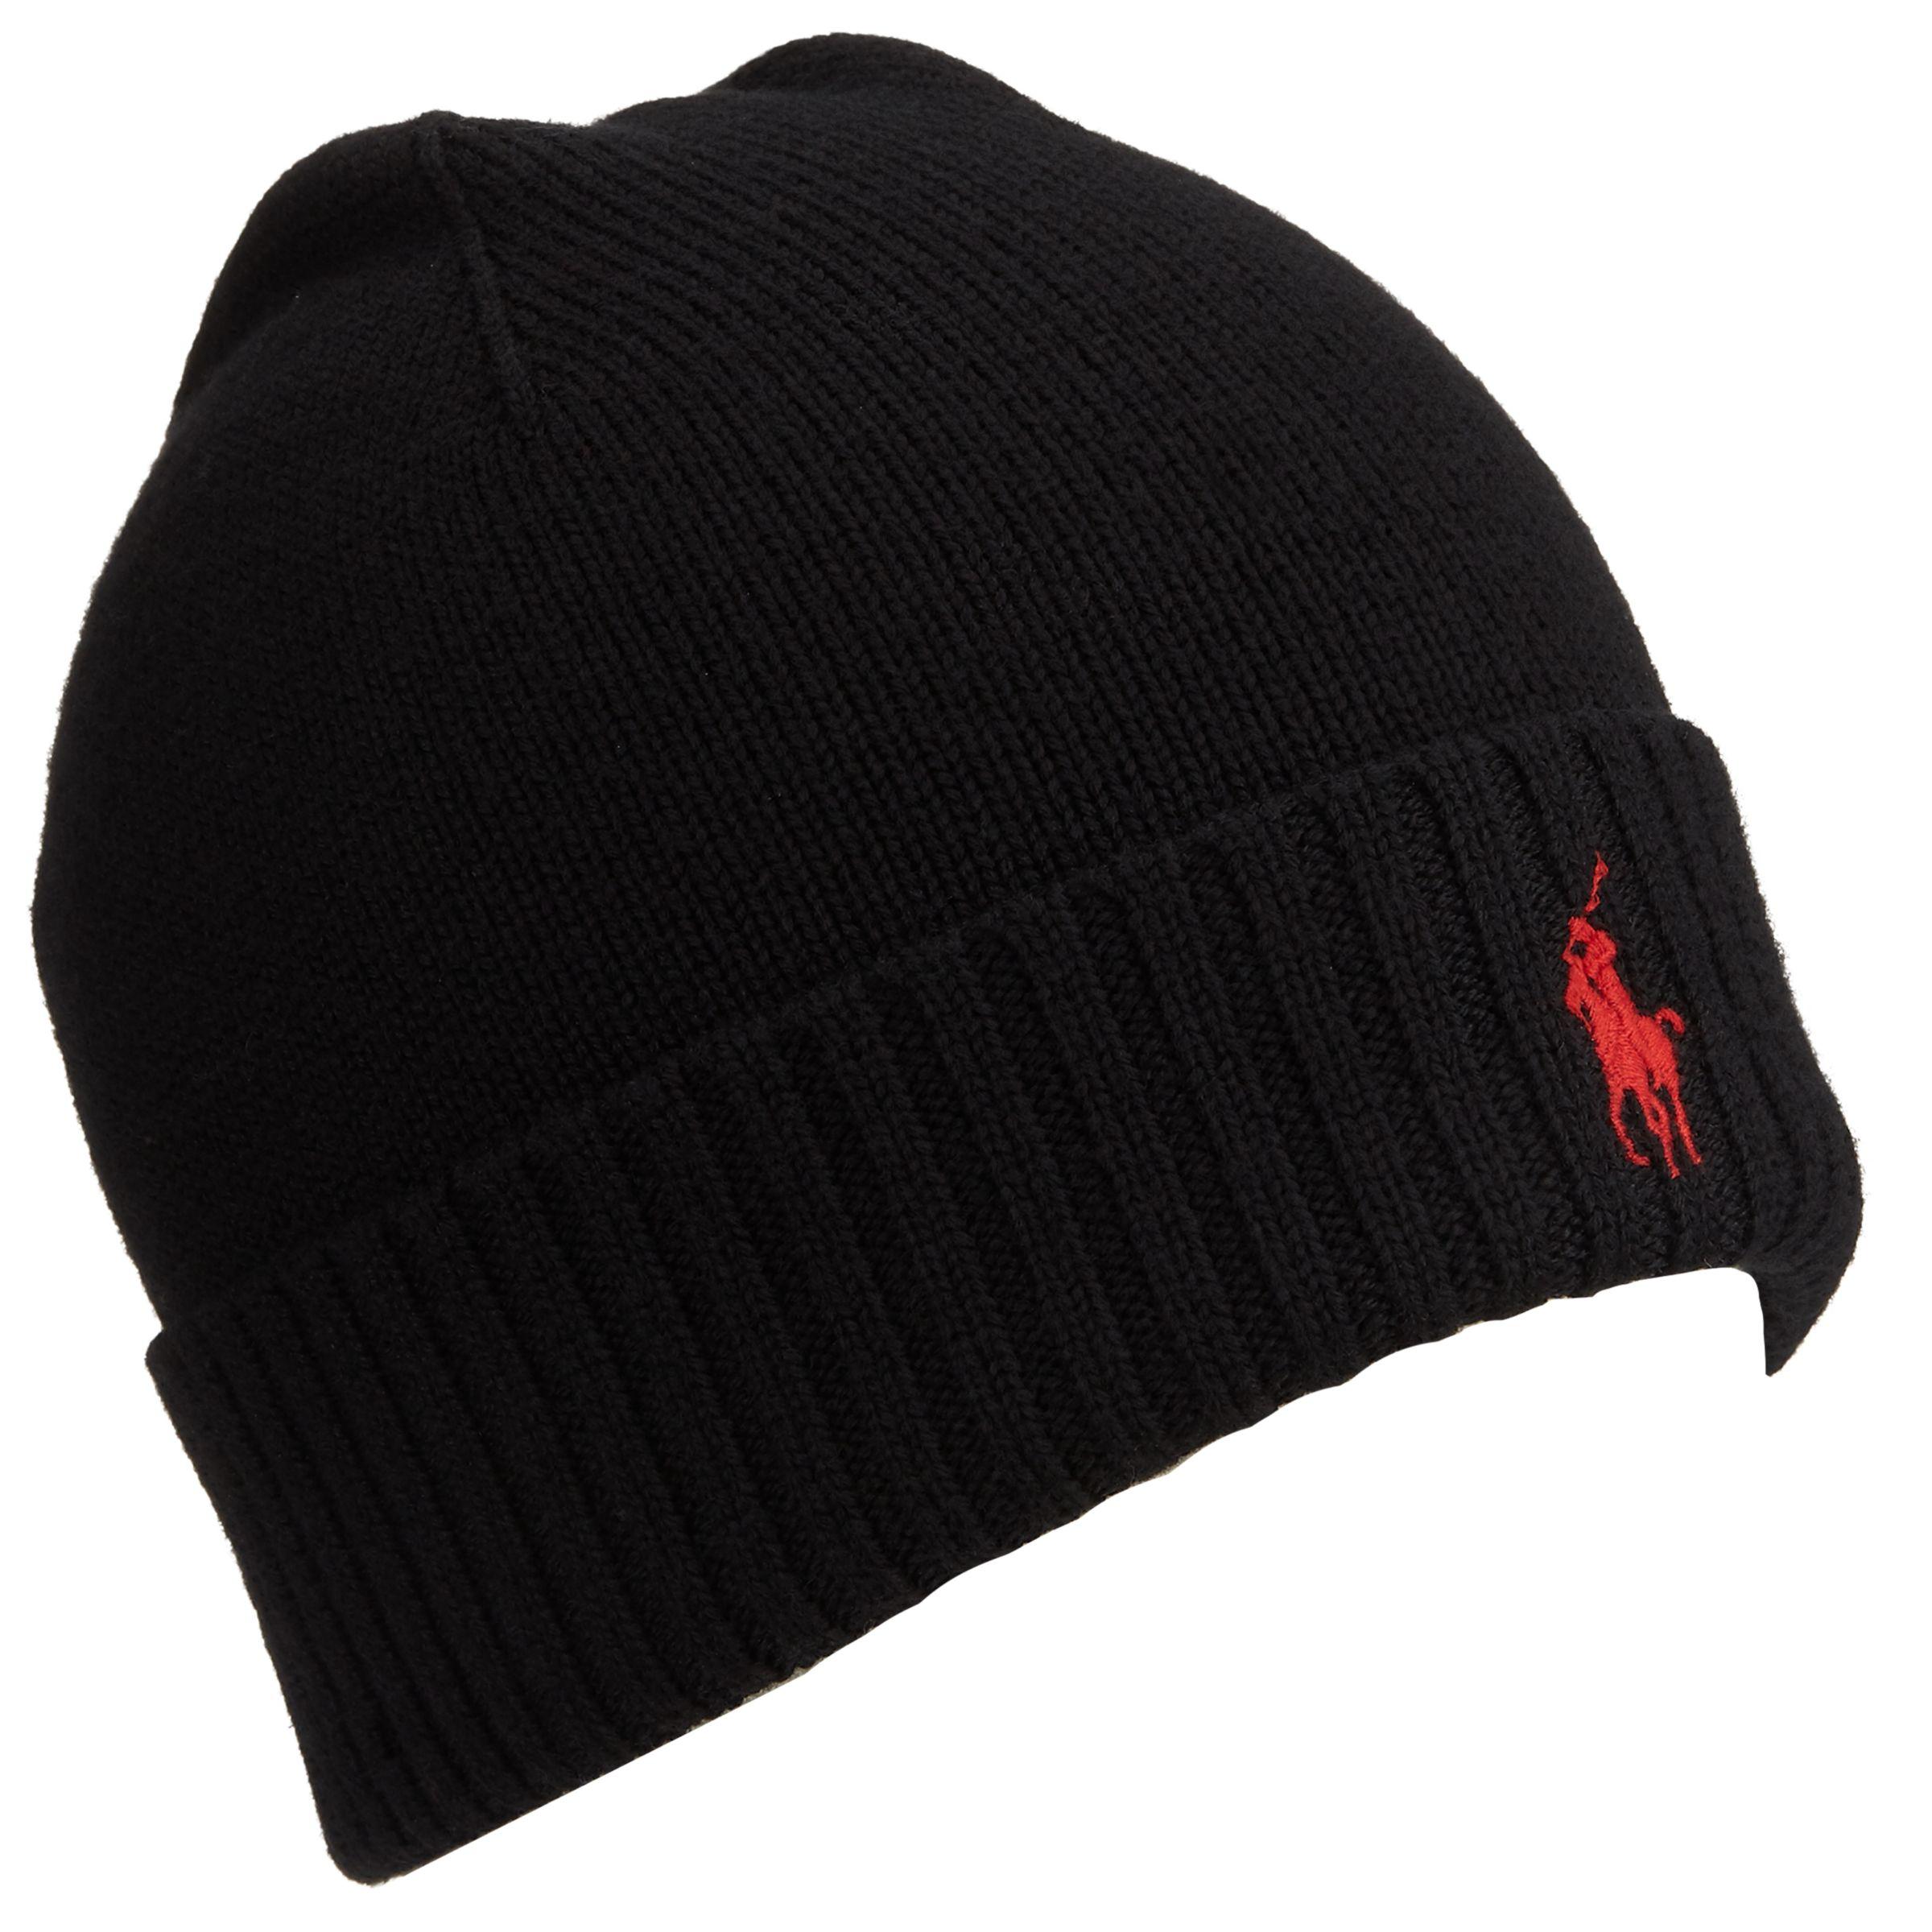 One Size Merino Wool Beanie Hat Black